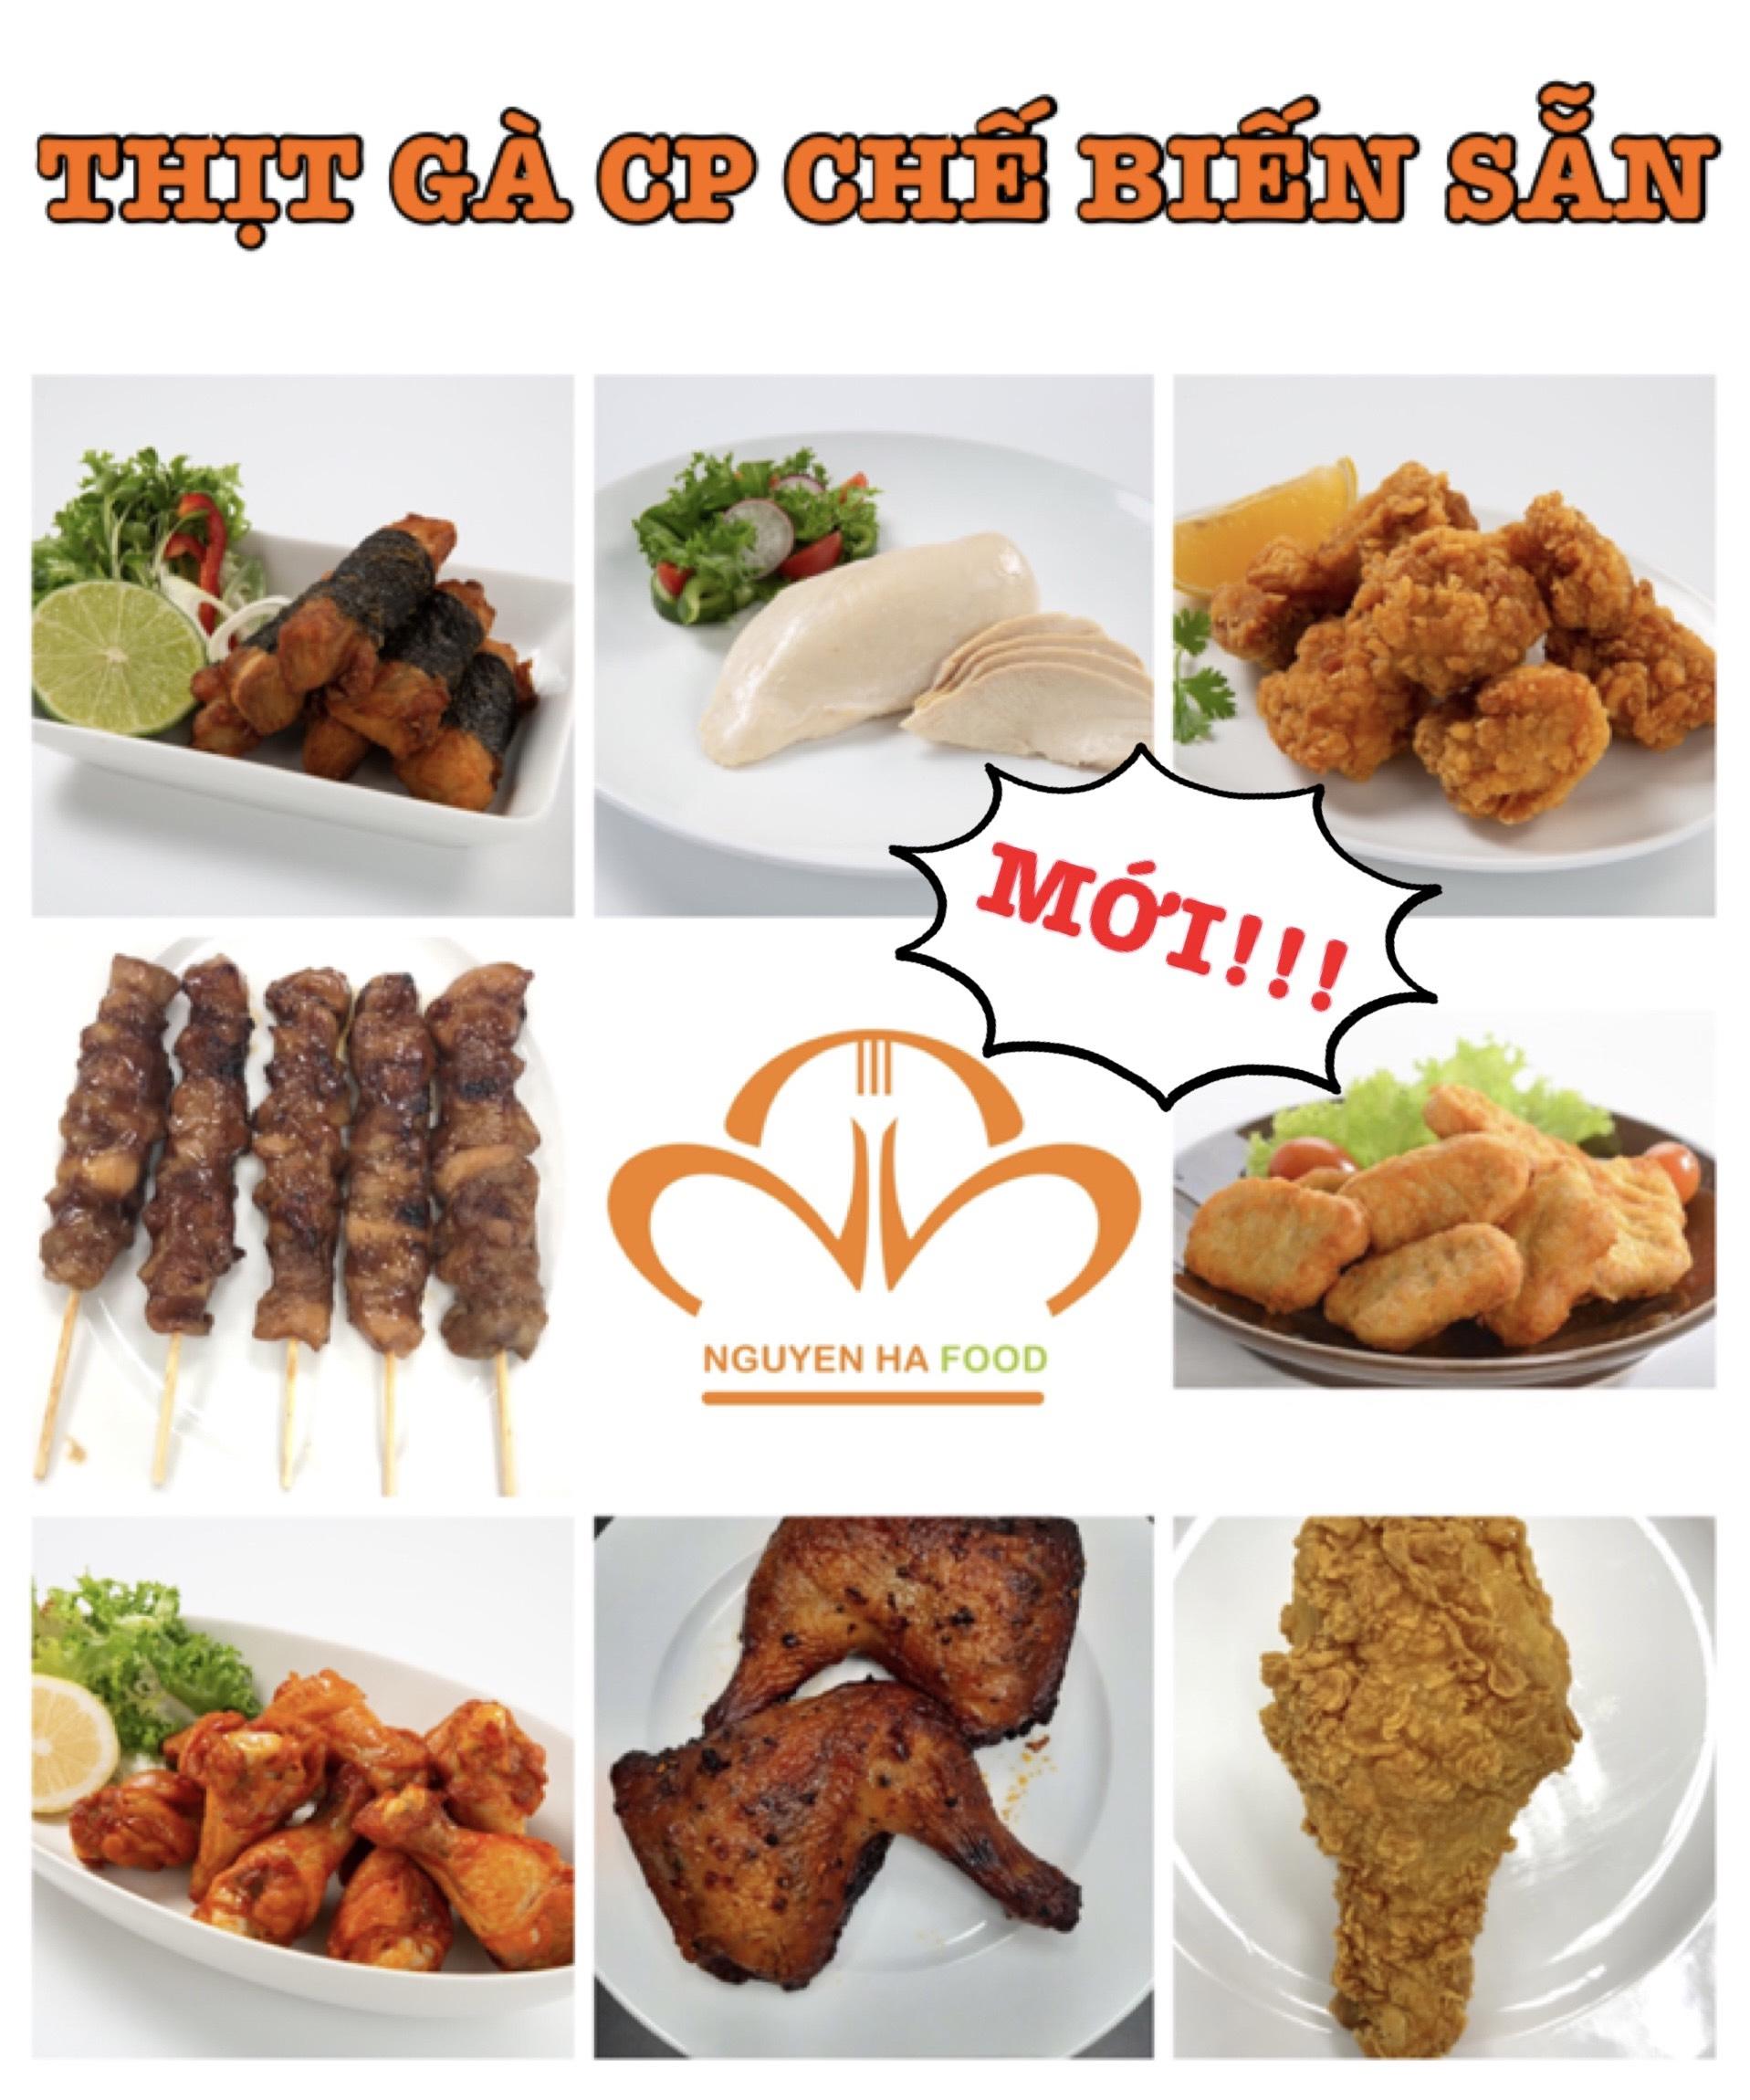 thit-ga-cp-che-bien-san-nguyen-ha-food(1)